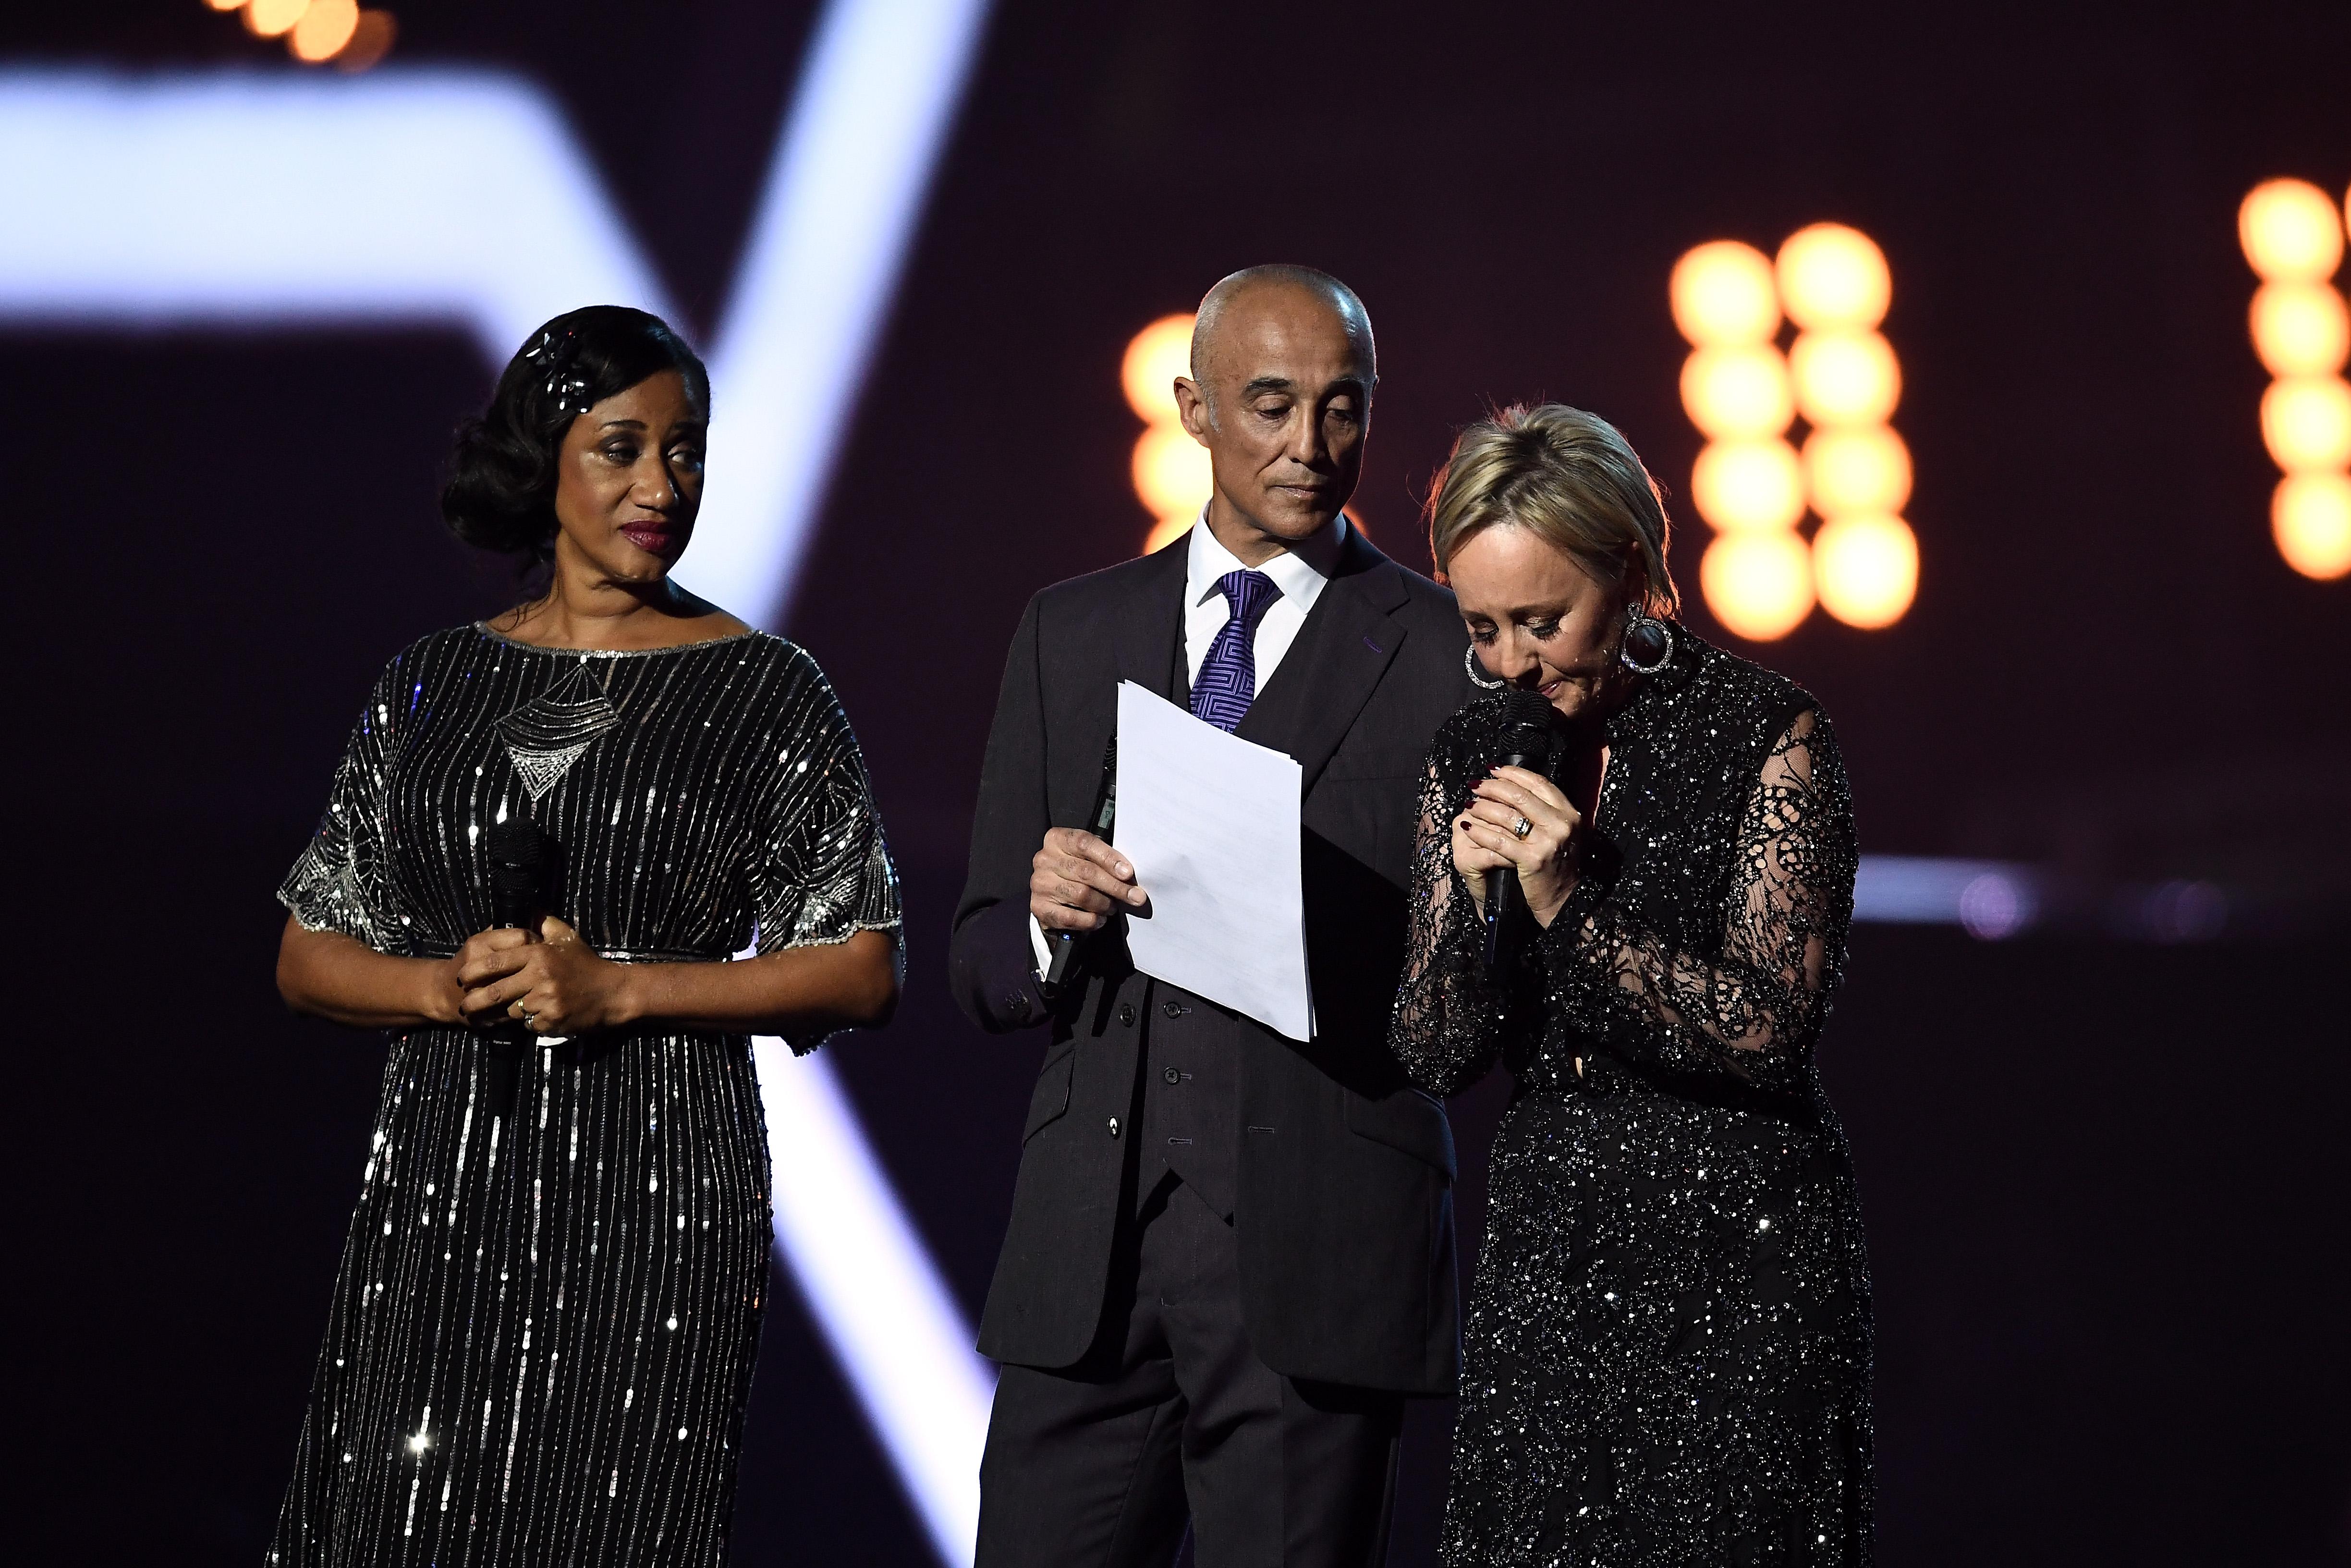 George Michael BRITs Tribute